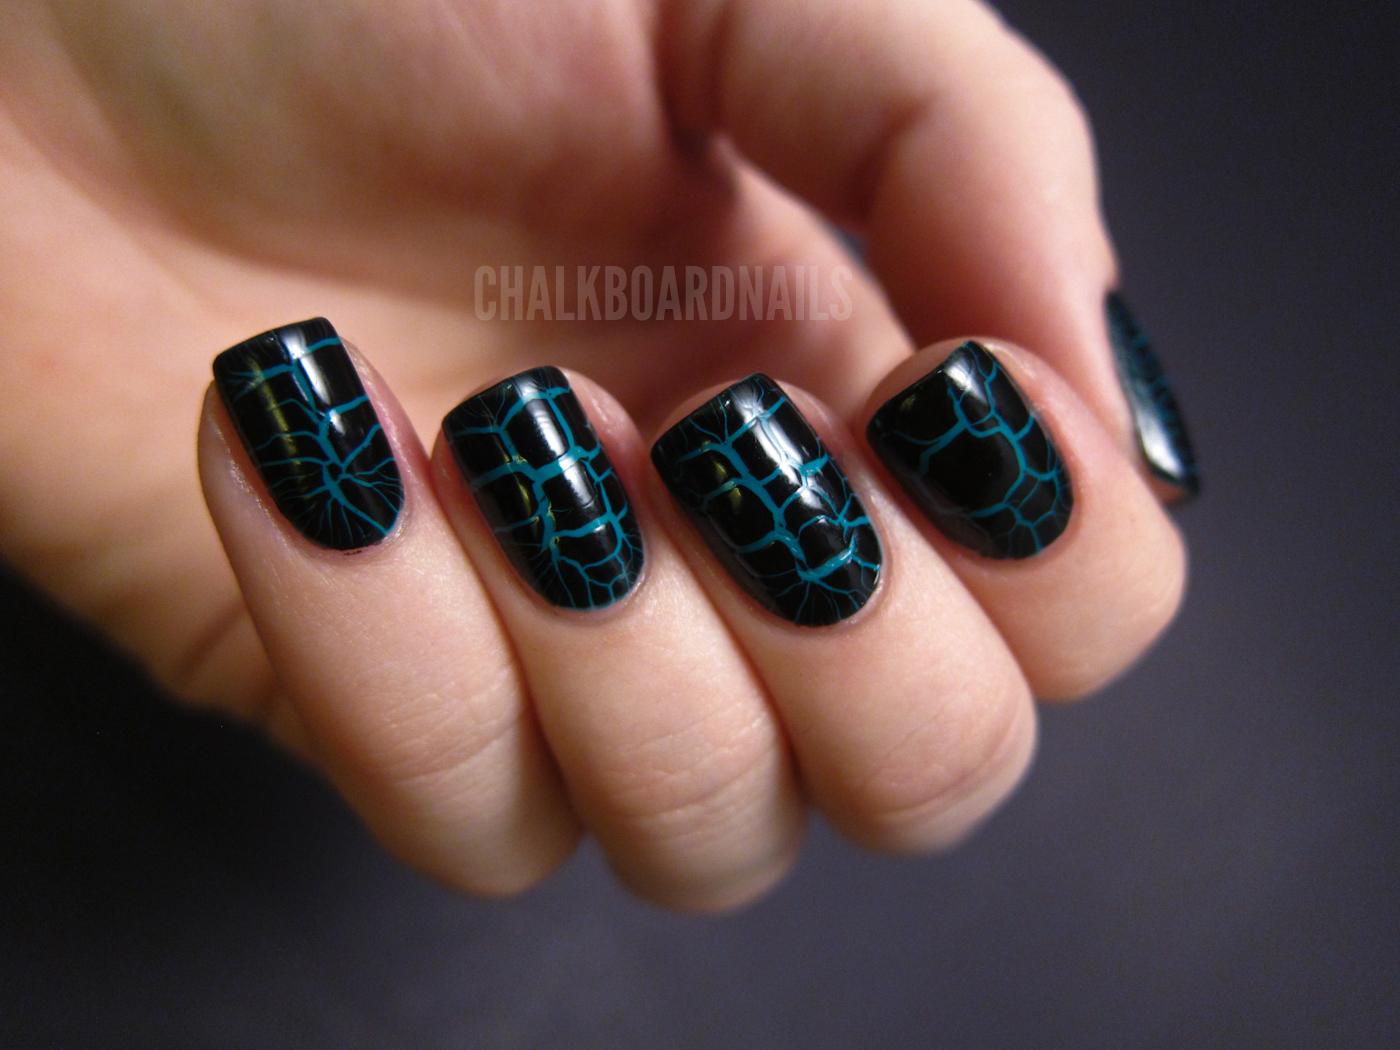 LCN Croco Fever Topcoats | Chalkboard Nails | Nail Art Blog